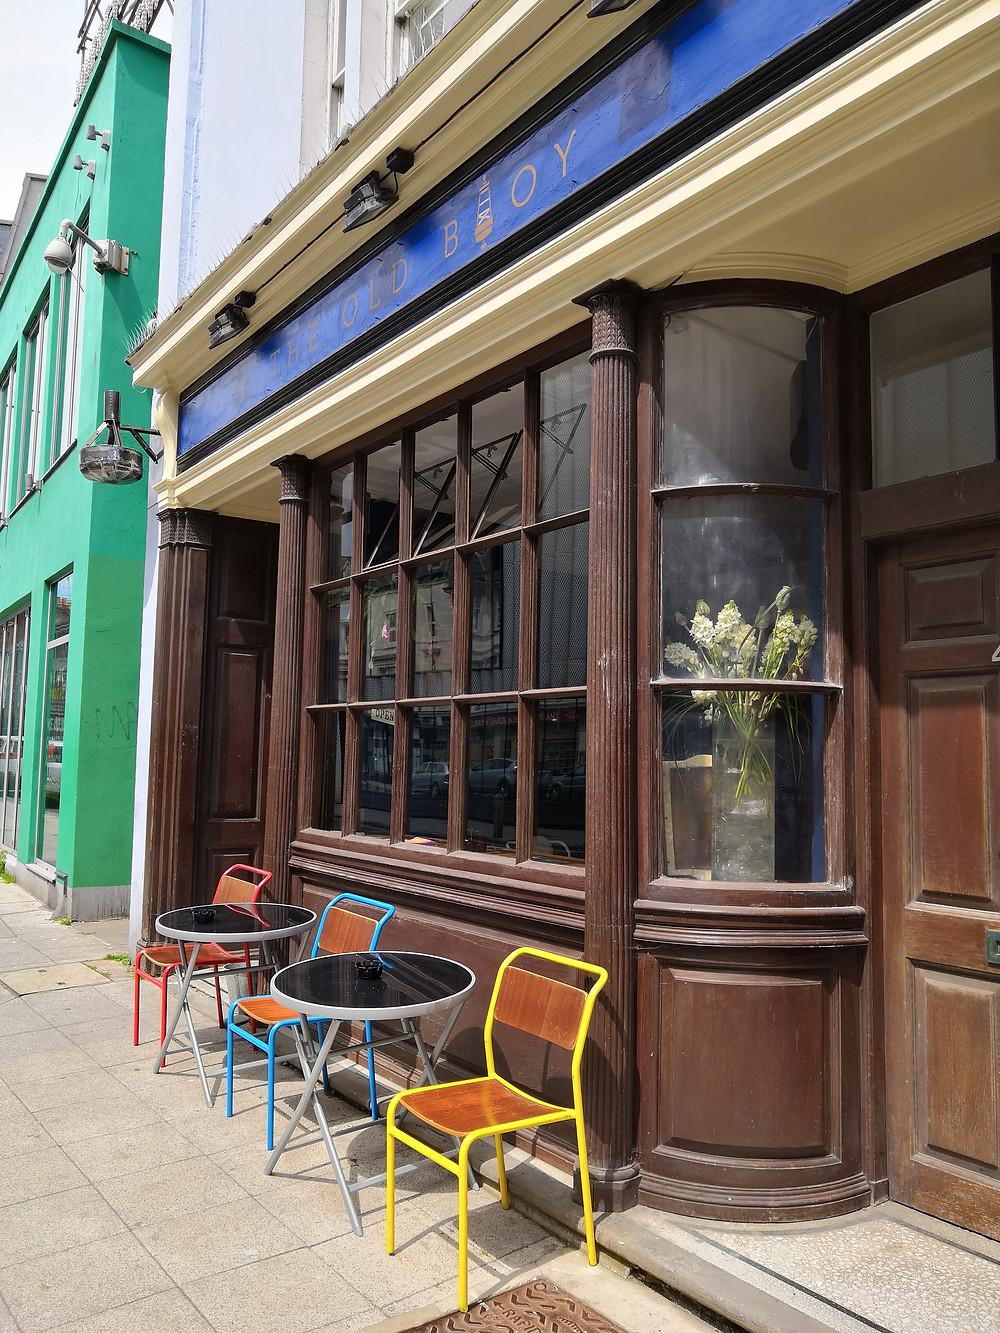 The Old Buoy, Folkestone